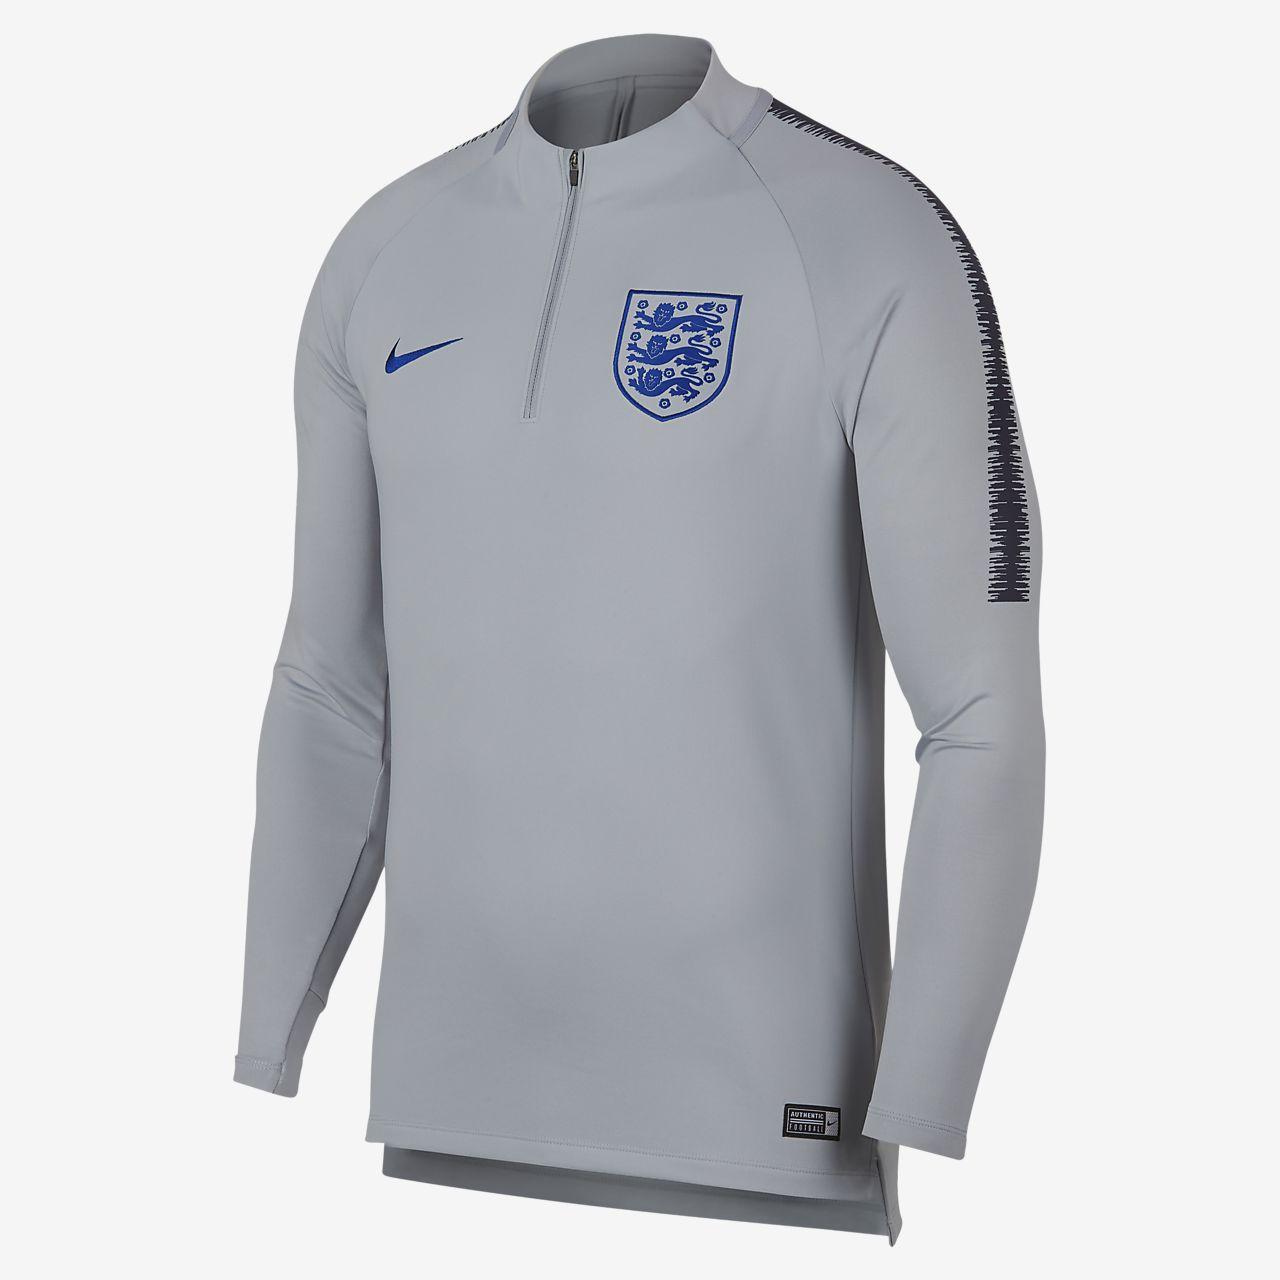 aa6d48aef5ff England Dri-FIT Squad Drill Men's Long-Sleeve Football Top. Nike.com CA